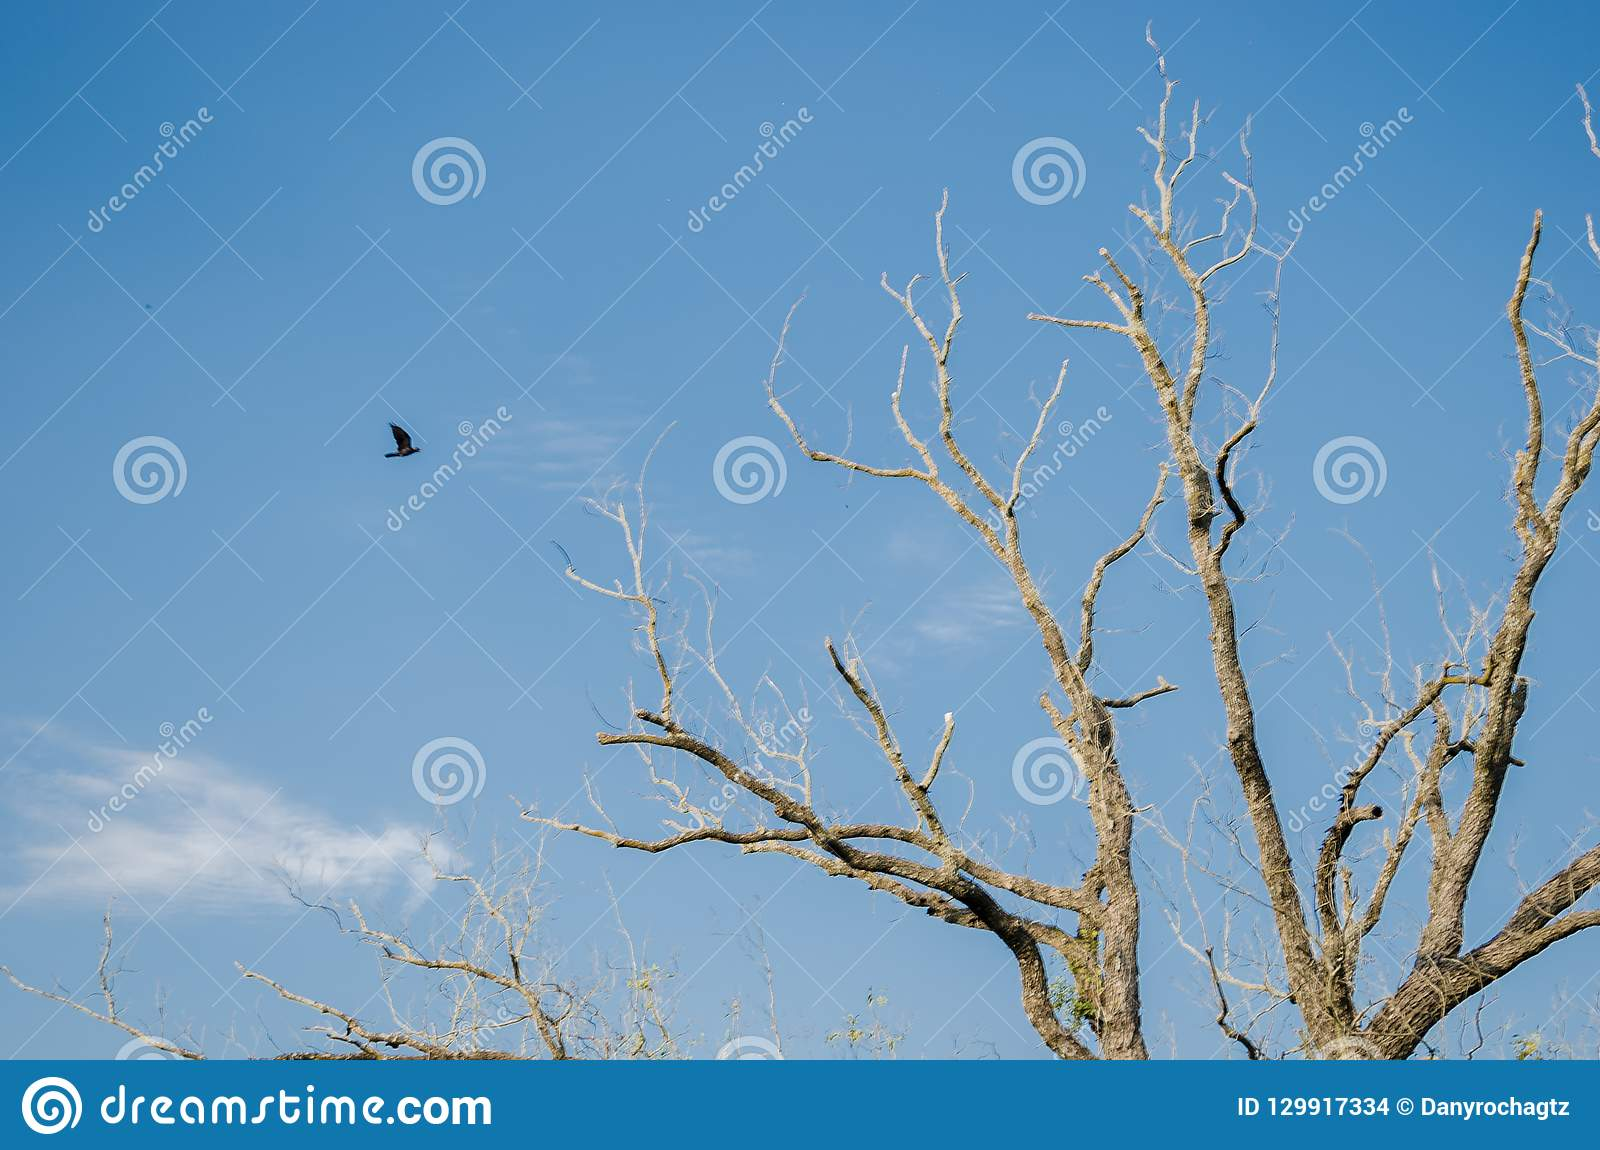 Un vol noir de corneille vers un grand arbre sec, fond avec un beau ciel bleu clair